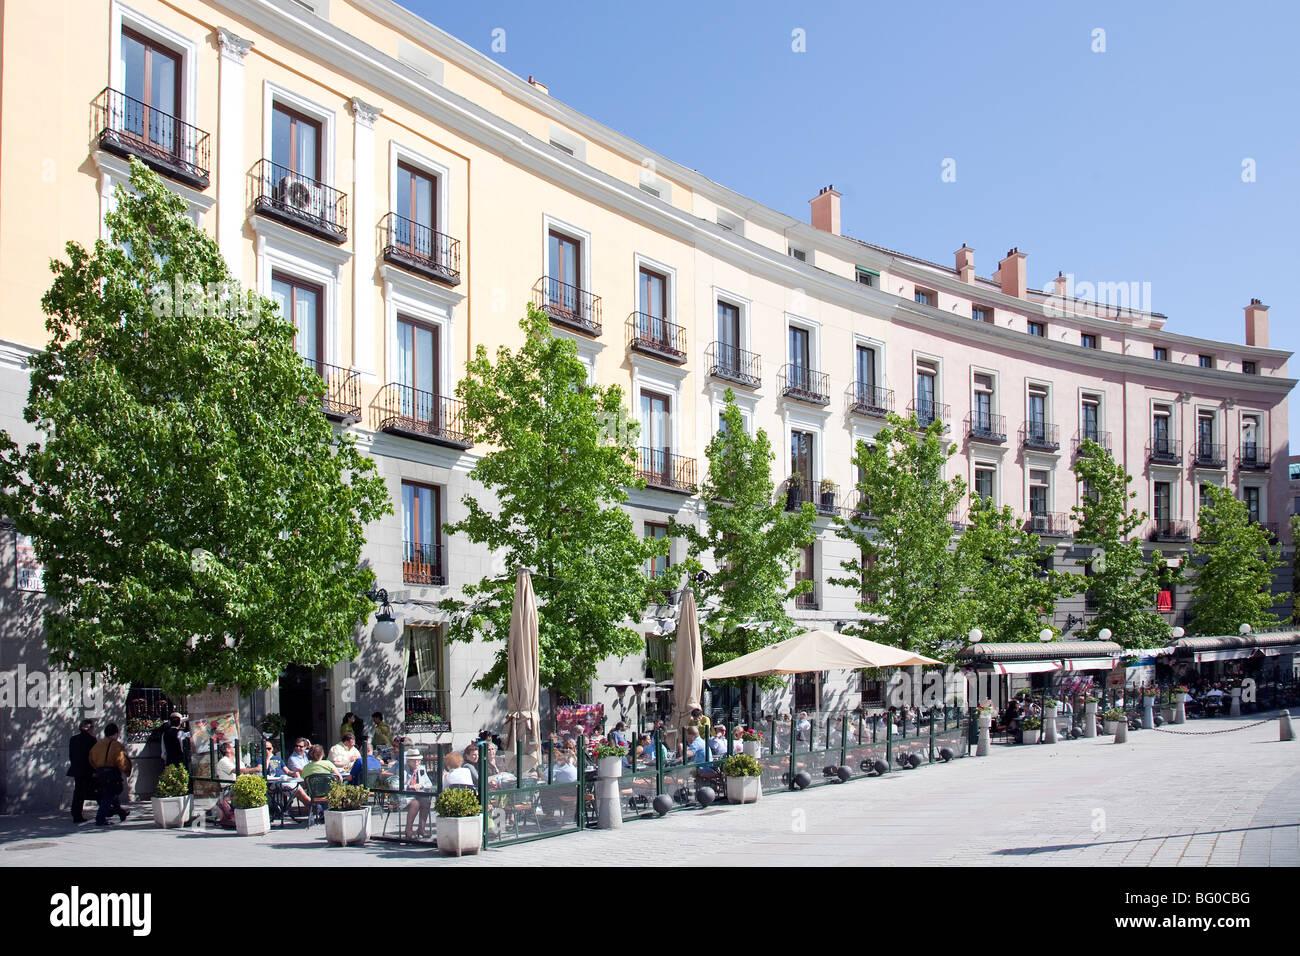 Sidewalk cafe in front of a building, Plaza de Oriente, Madrid, Spain Stock Photo